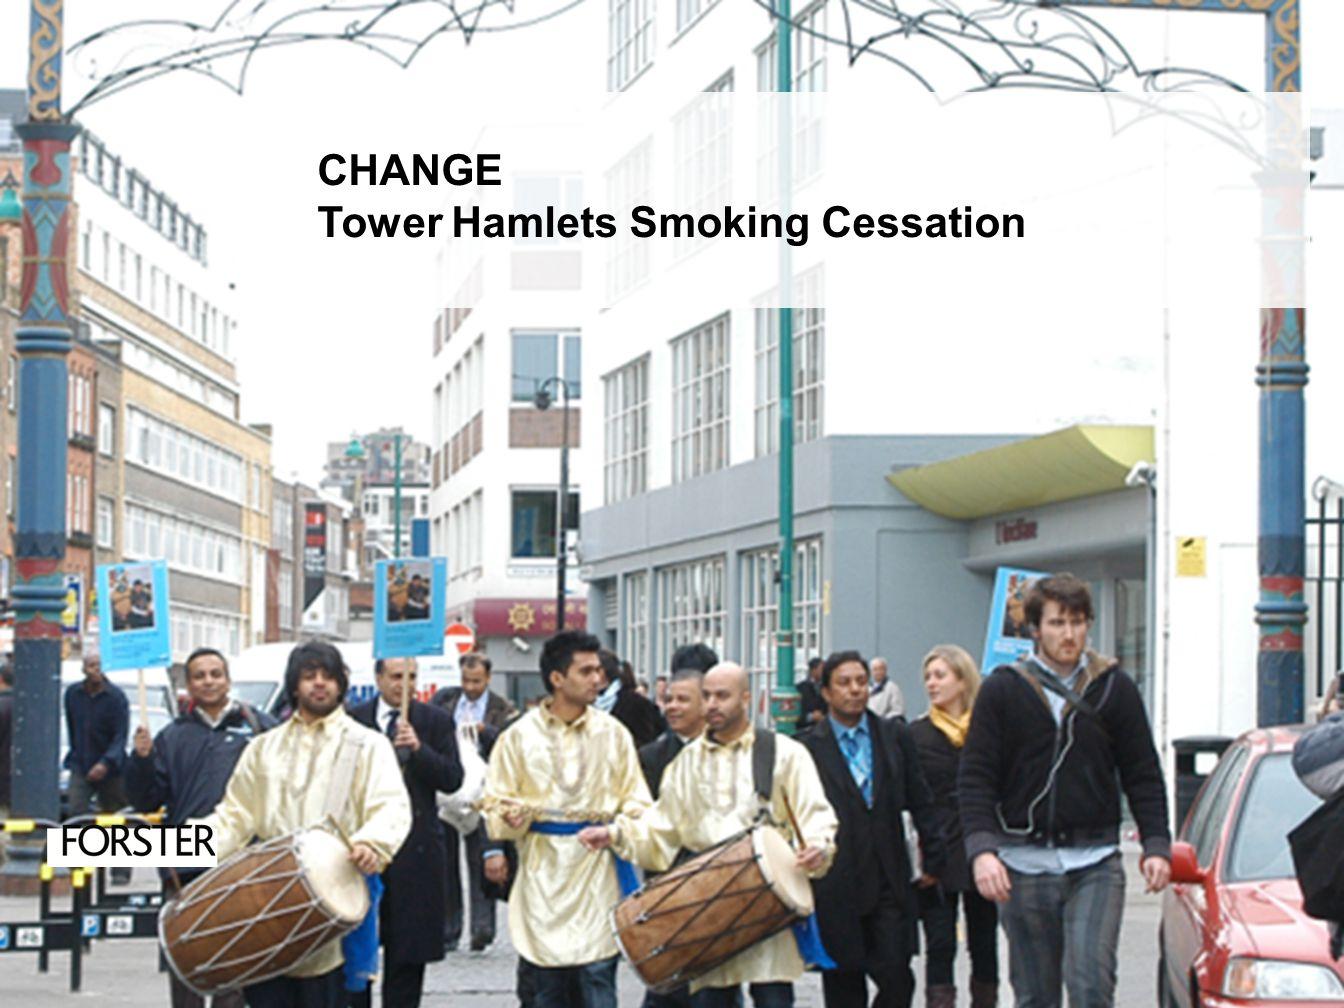 CHANGE Tower Hamlets Smoking Cessation